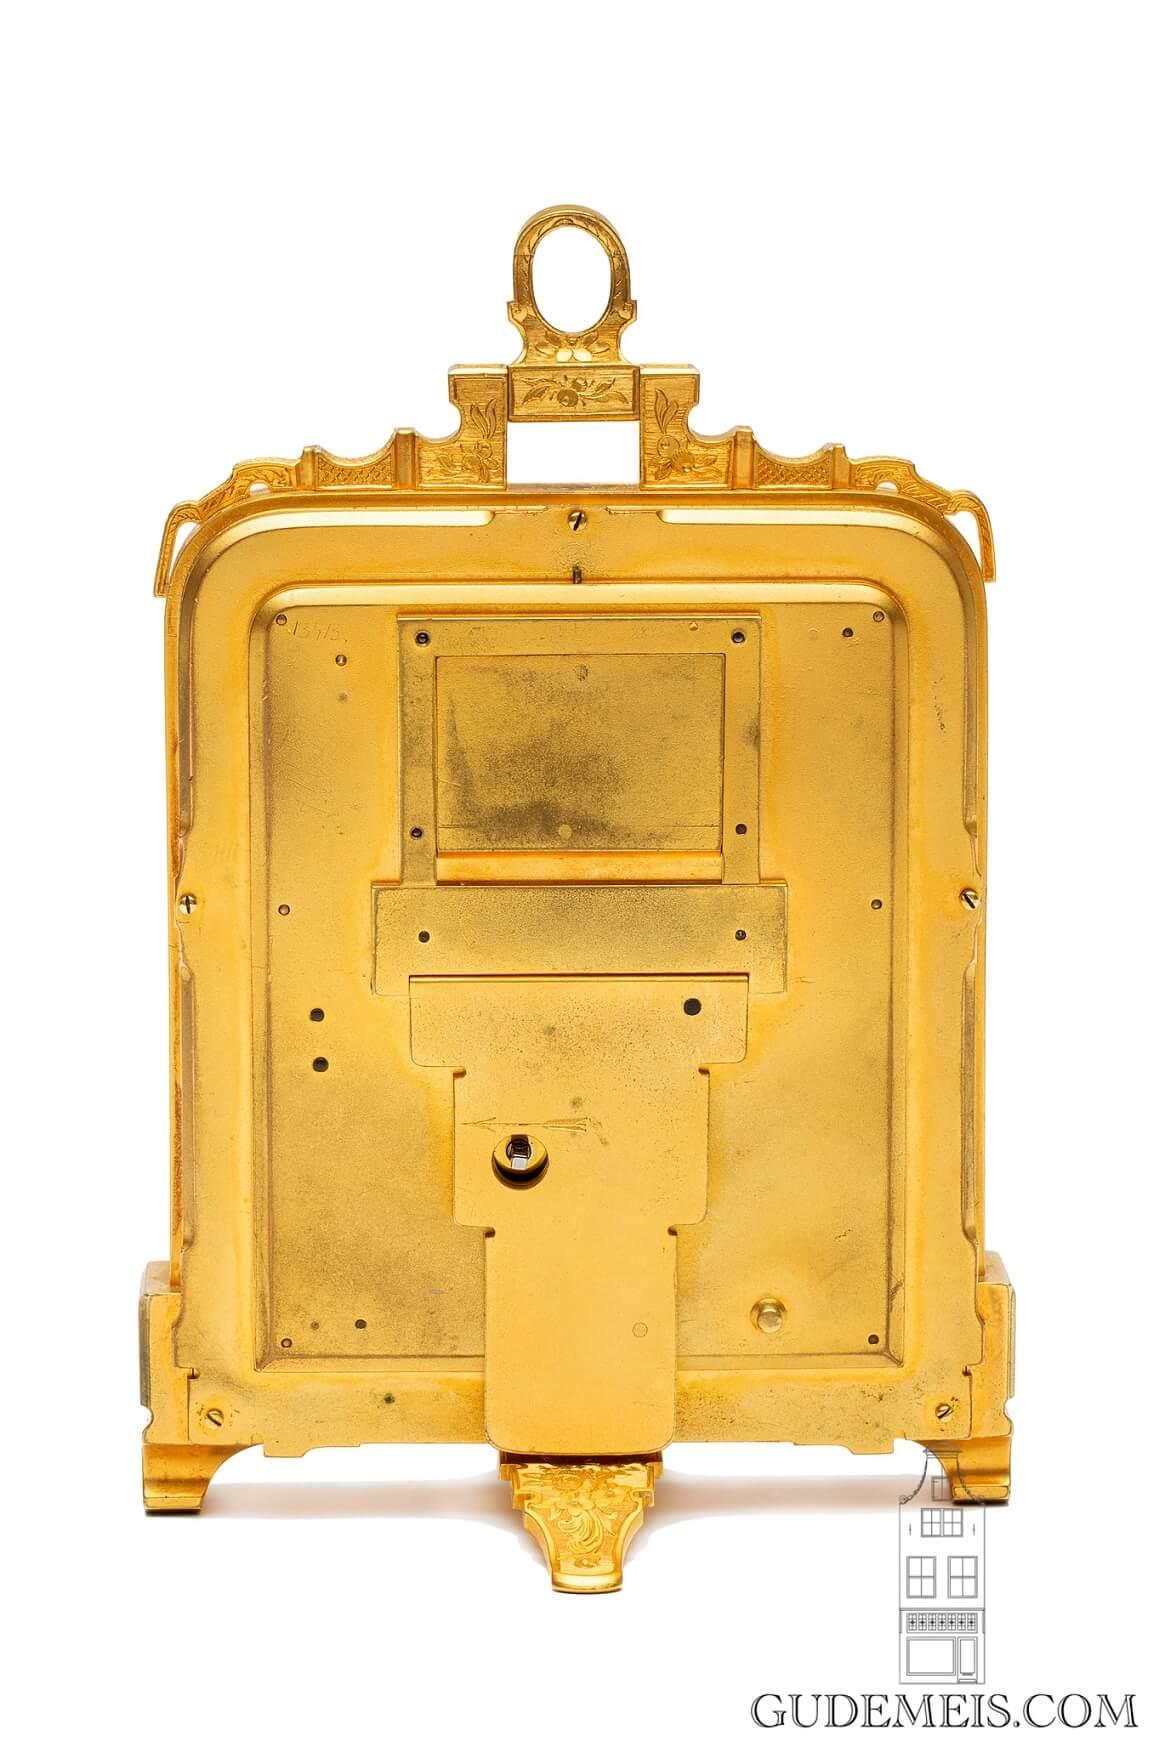 English-Victorian-engraved-gilt-brass-Thomas-Cole-strut-pre numbered-travel-desk-calendar-antique-clock-